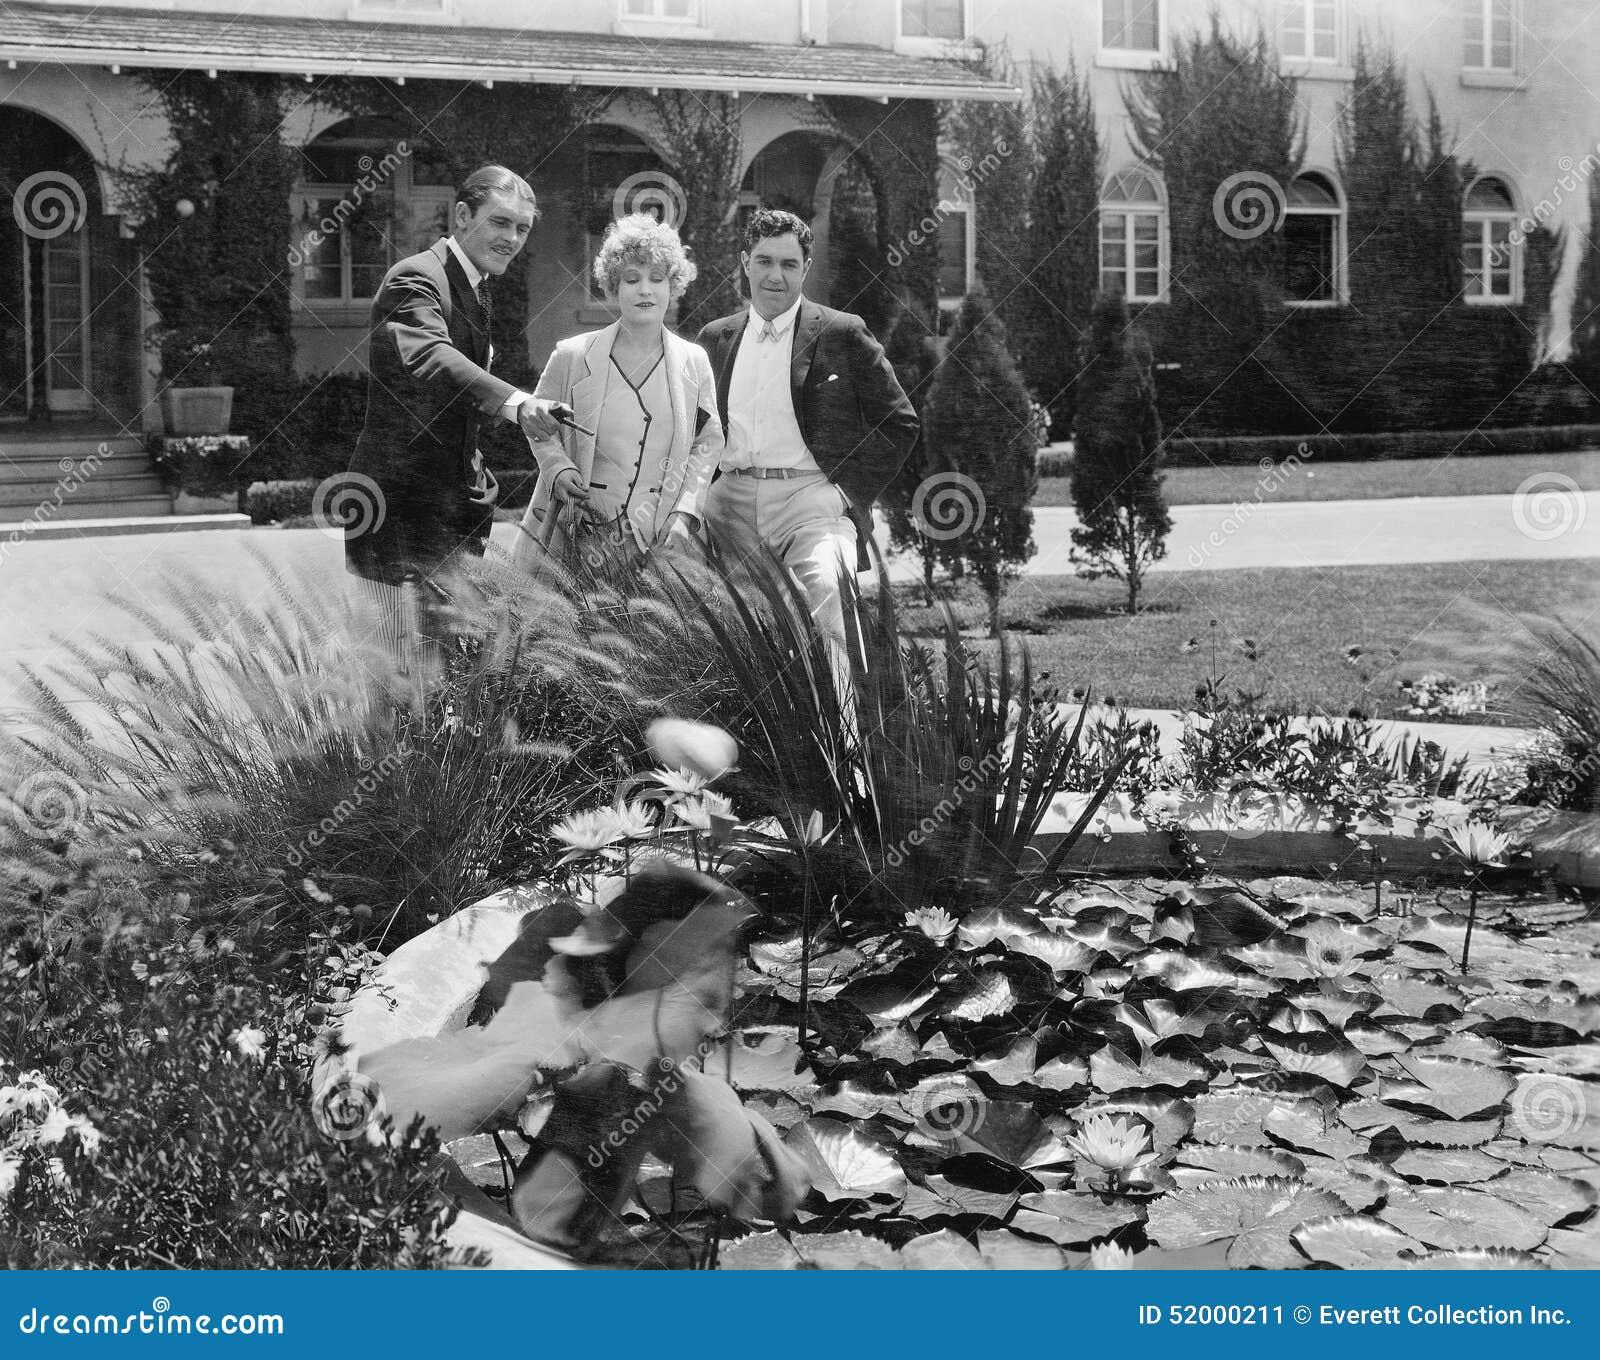 People admiring plants in pond in garden